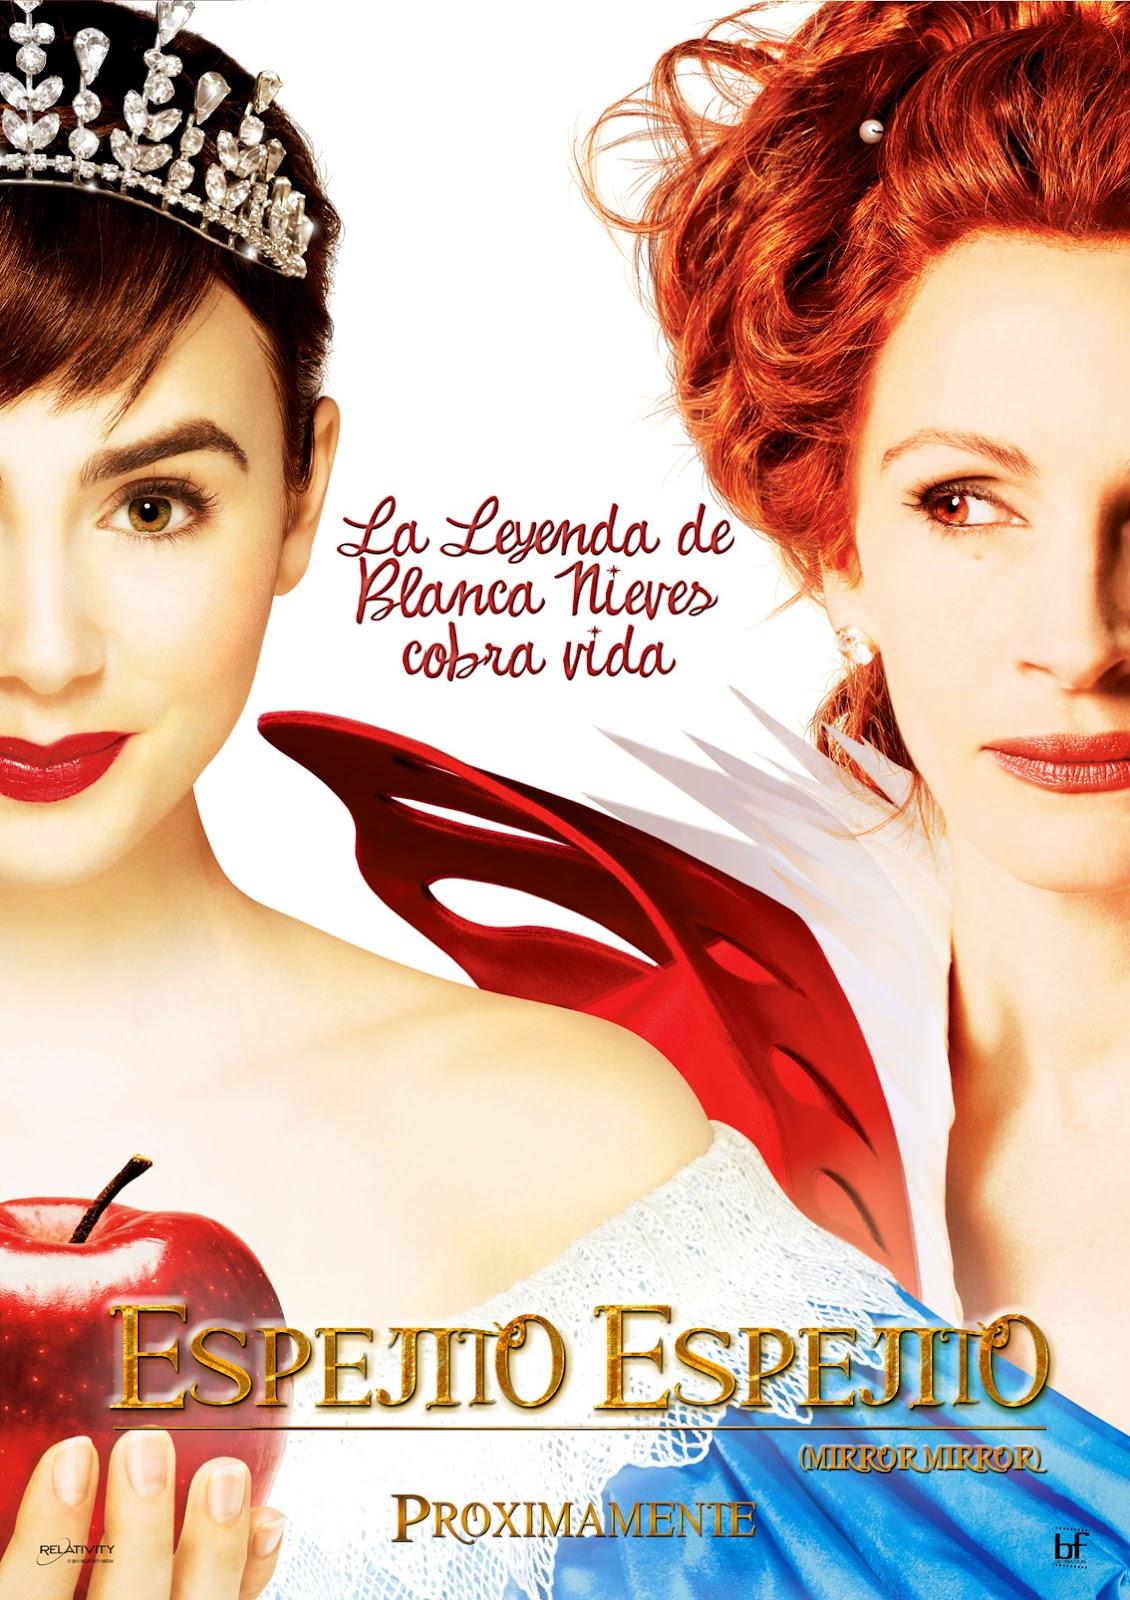 Espejito espejito 2012 review propio taringa for Espejito espejito